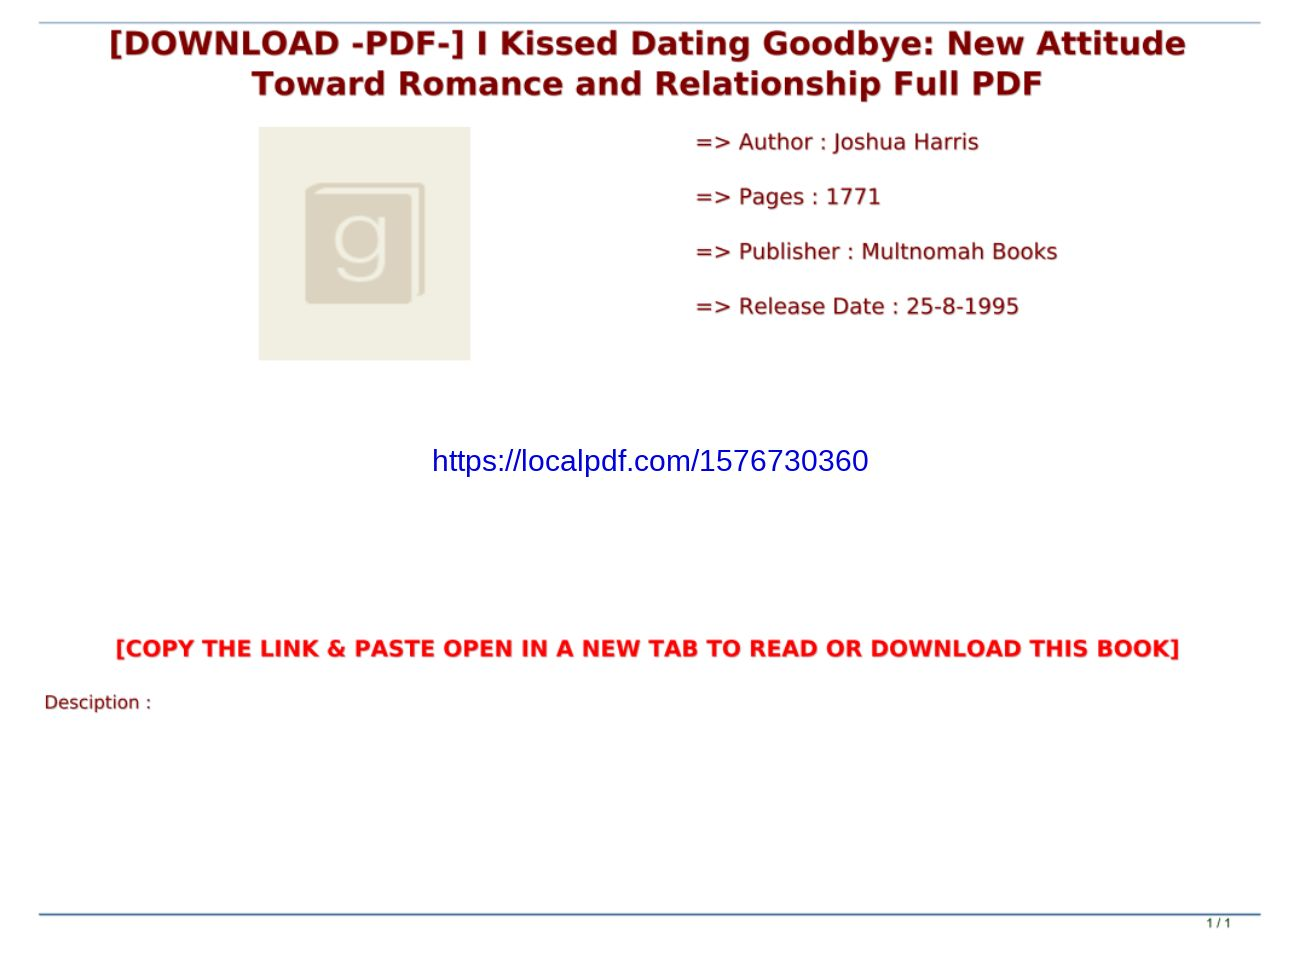 I Kissed Dating Goodbye Pdf Download